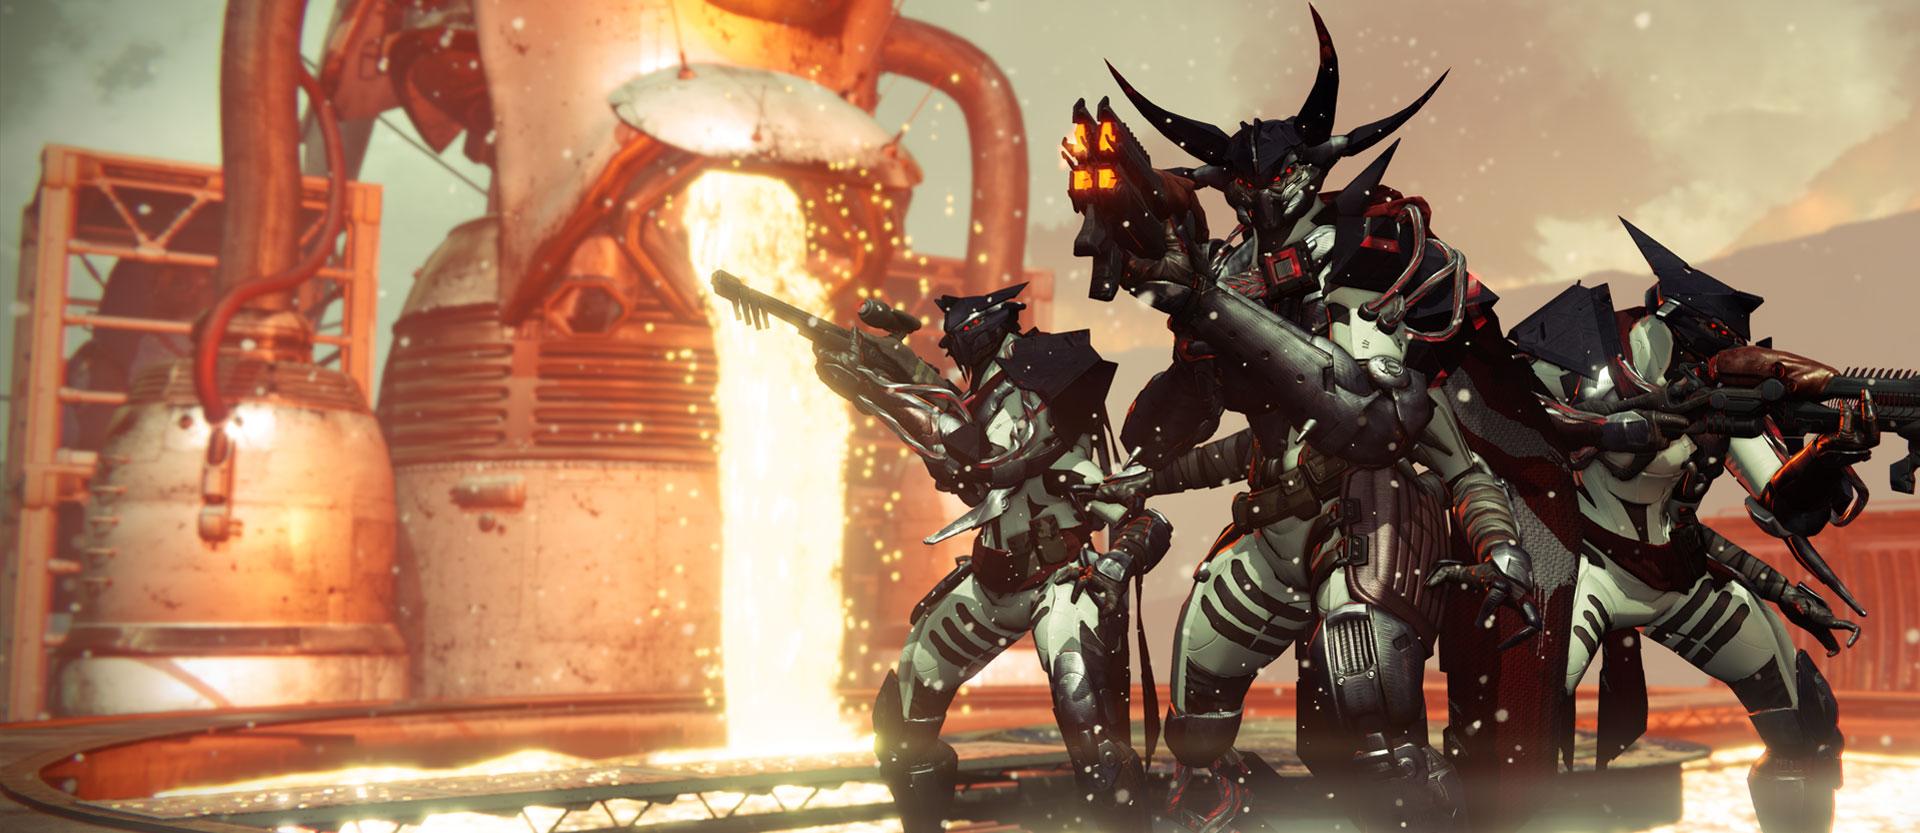 destiny_rise_of_iron-splicers